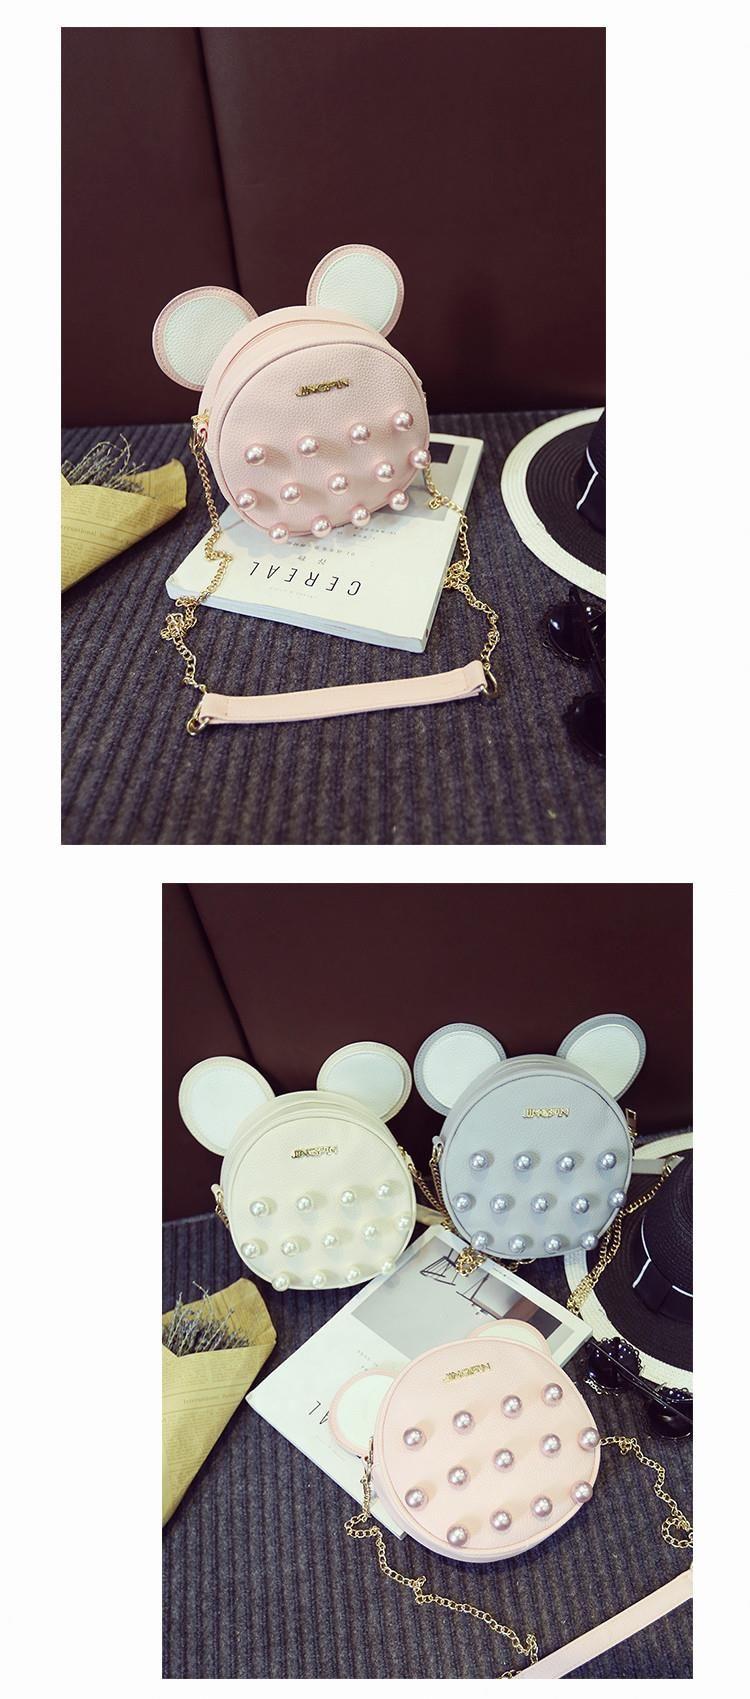 2f6e2624a getSubject() Desenho Animado Mickey, Bolsa De Ombro, Desenhos Animados,